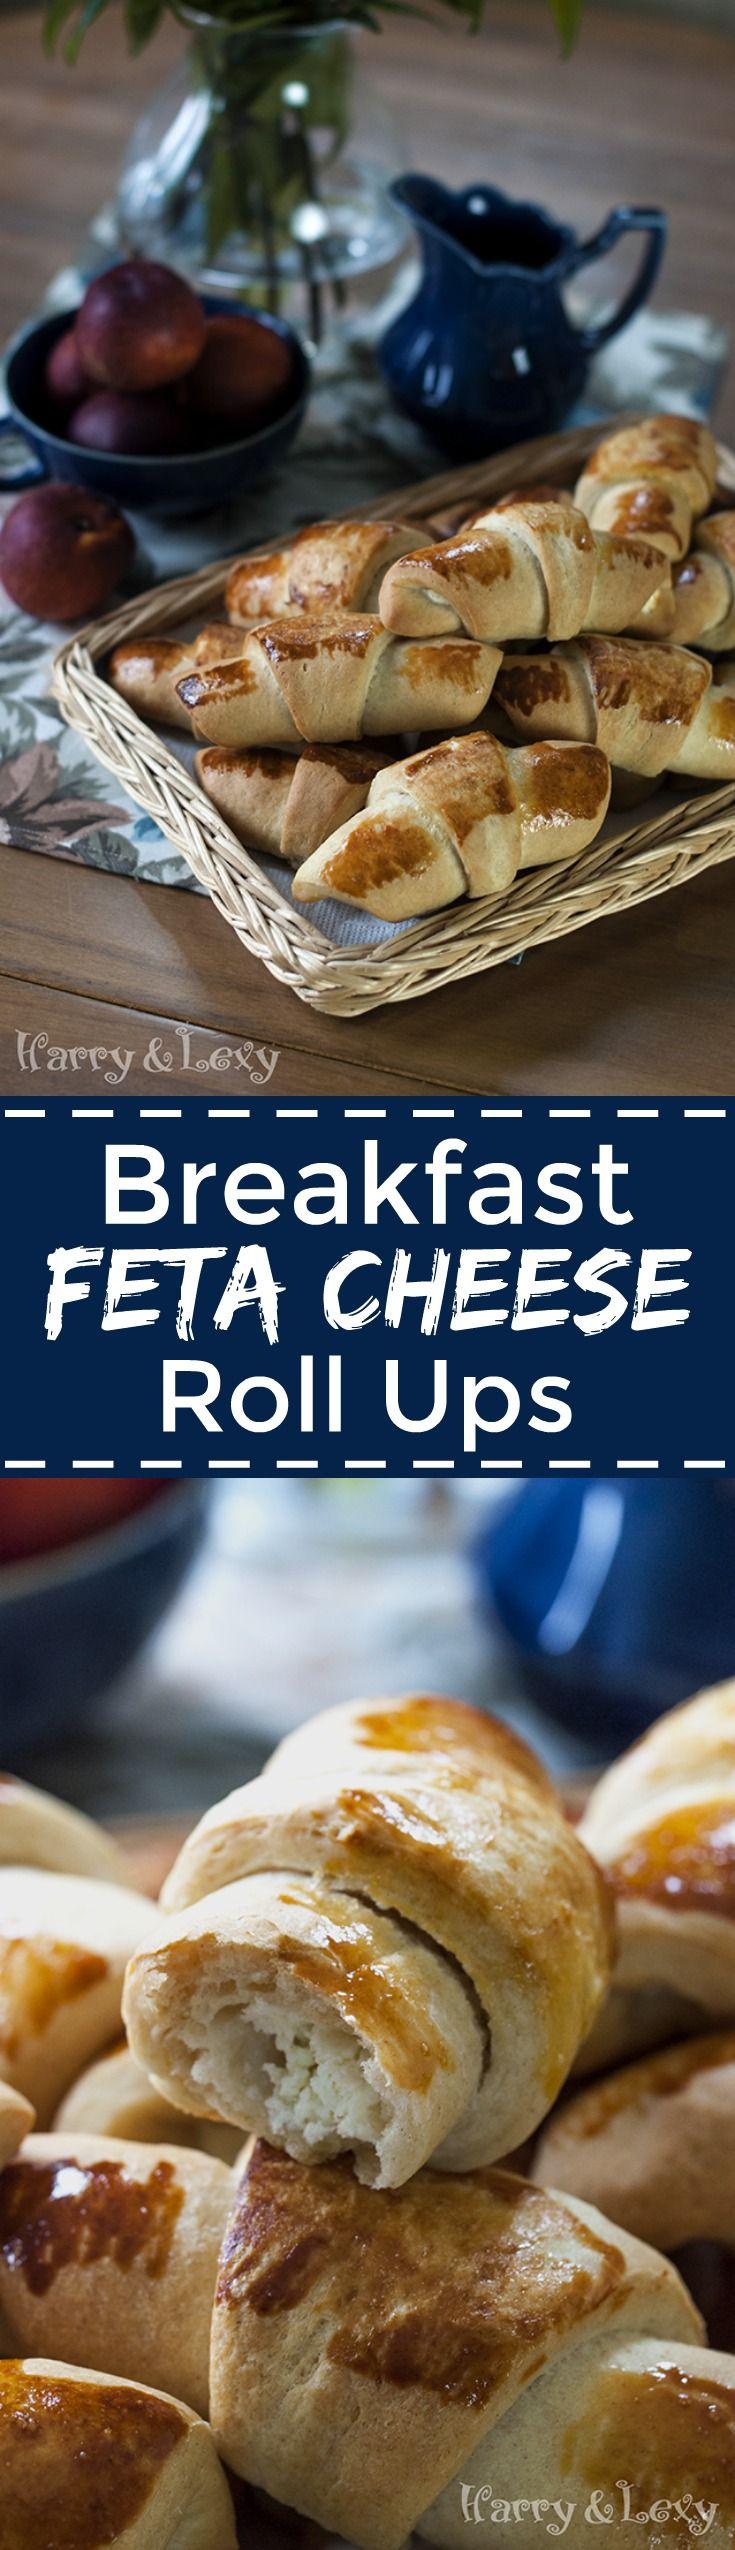 Breakfast Feta Cheese Roll Ups